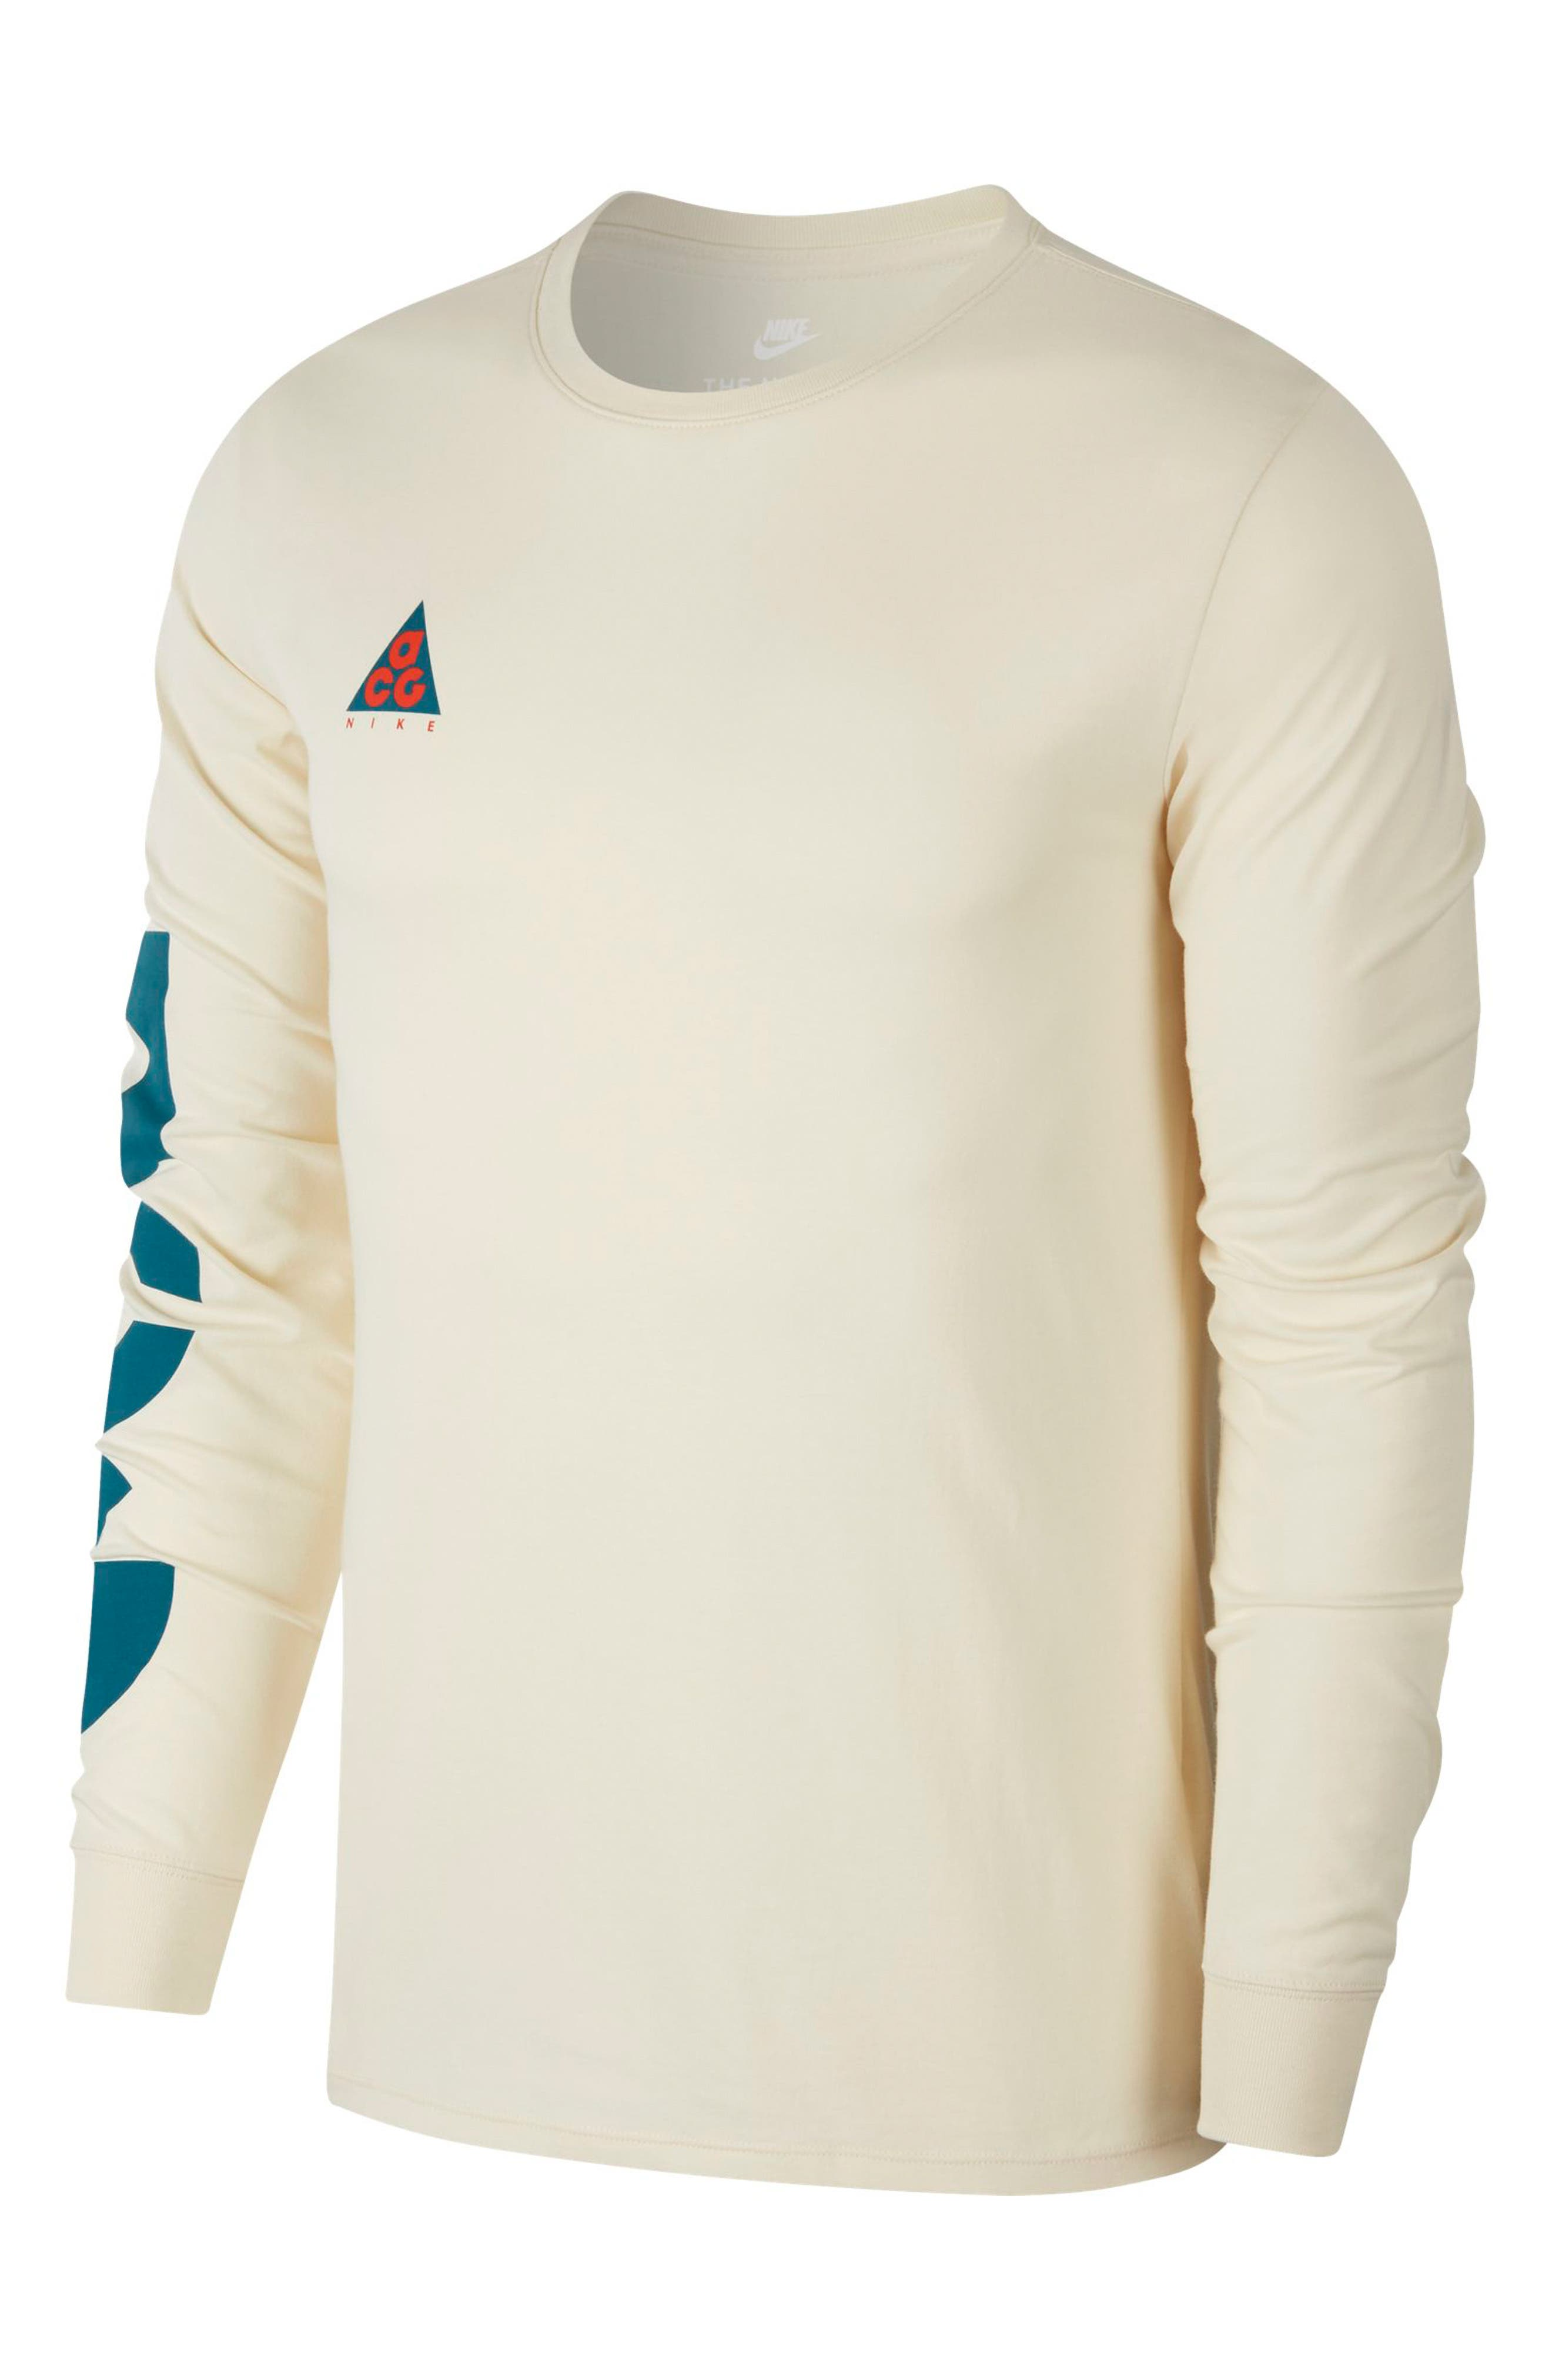 Nike Nsw Acg Graphic T-Shirt, Beige